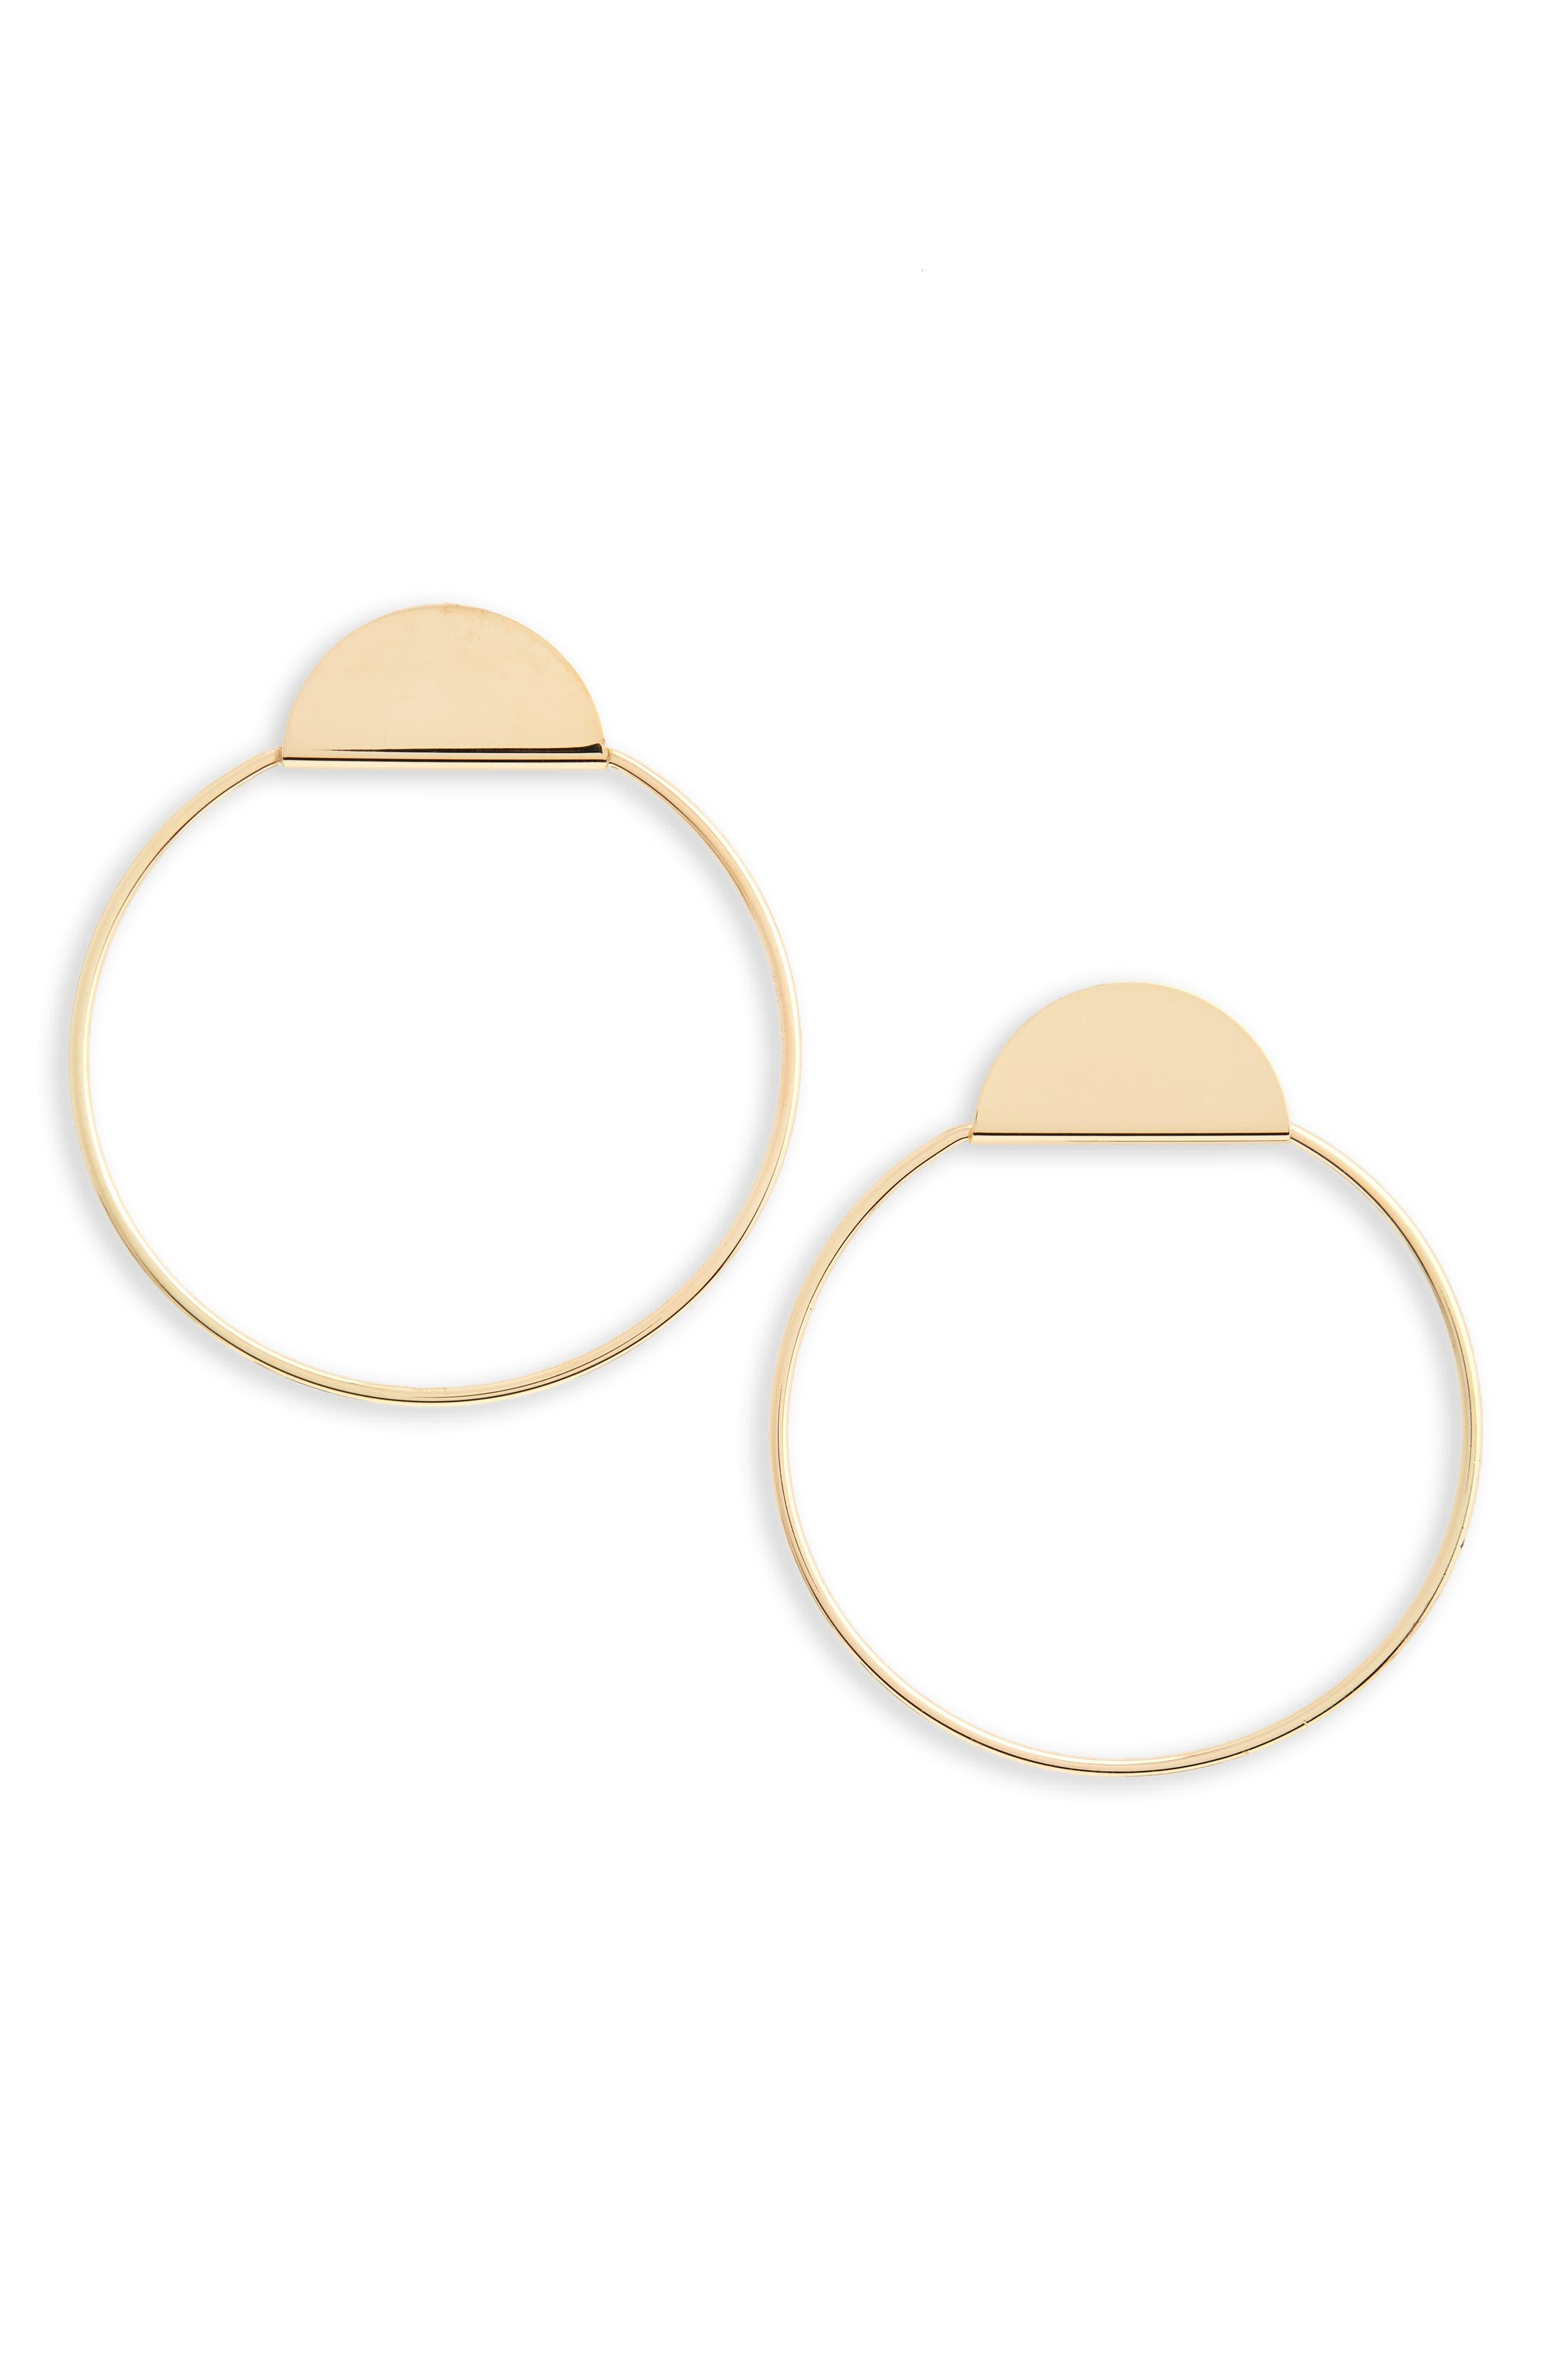 Half-Circle & Hoop Earrings,                             Main thumbnail 1, color,                             710